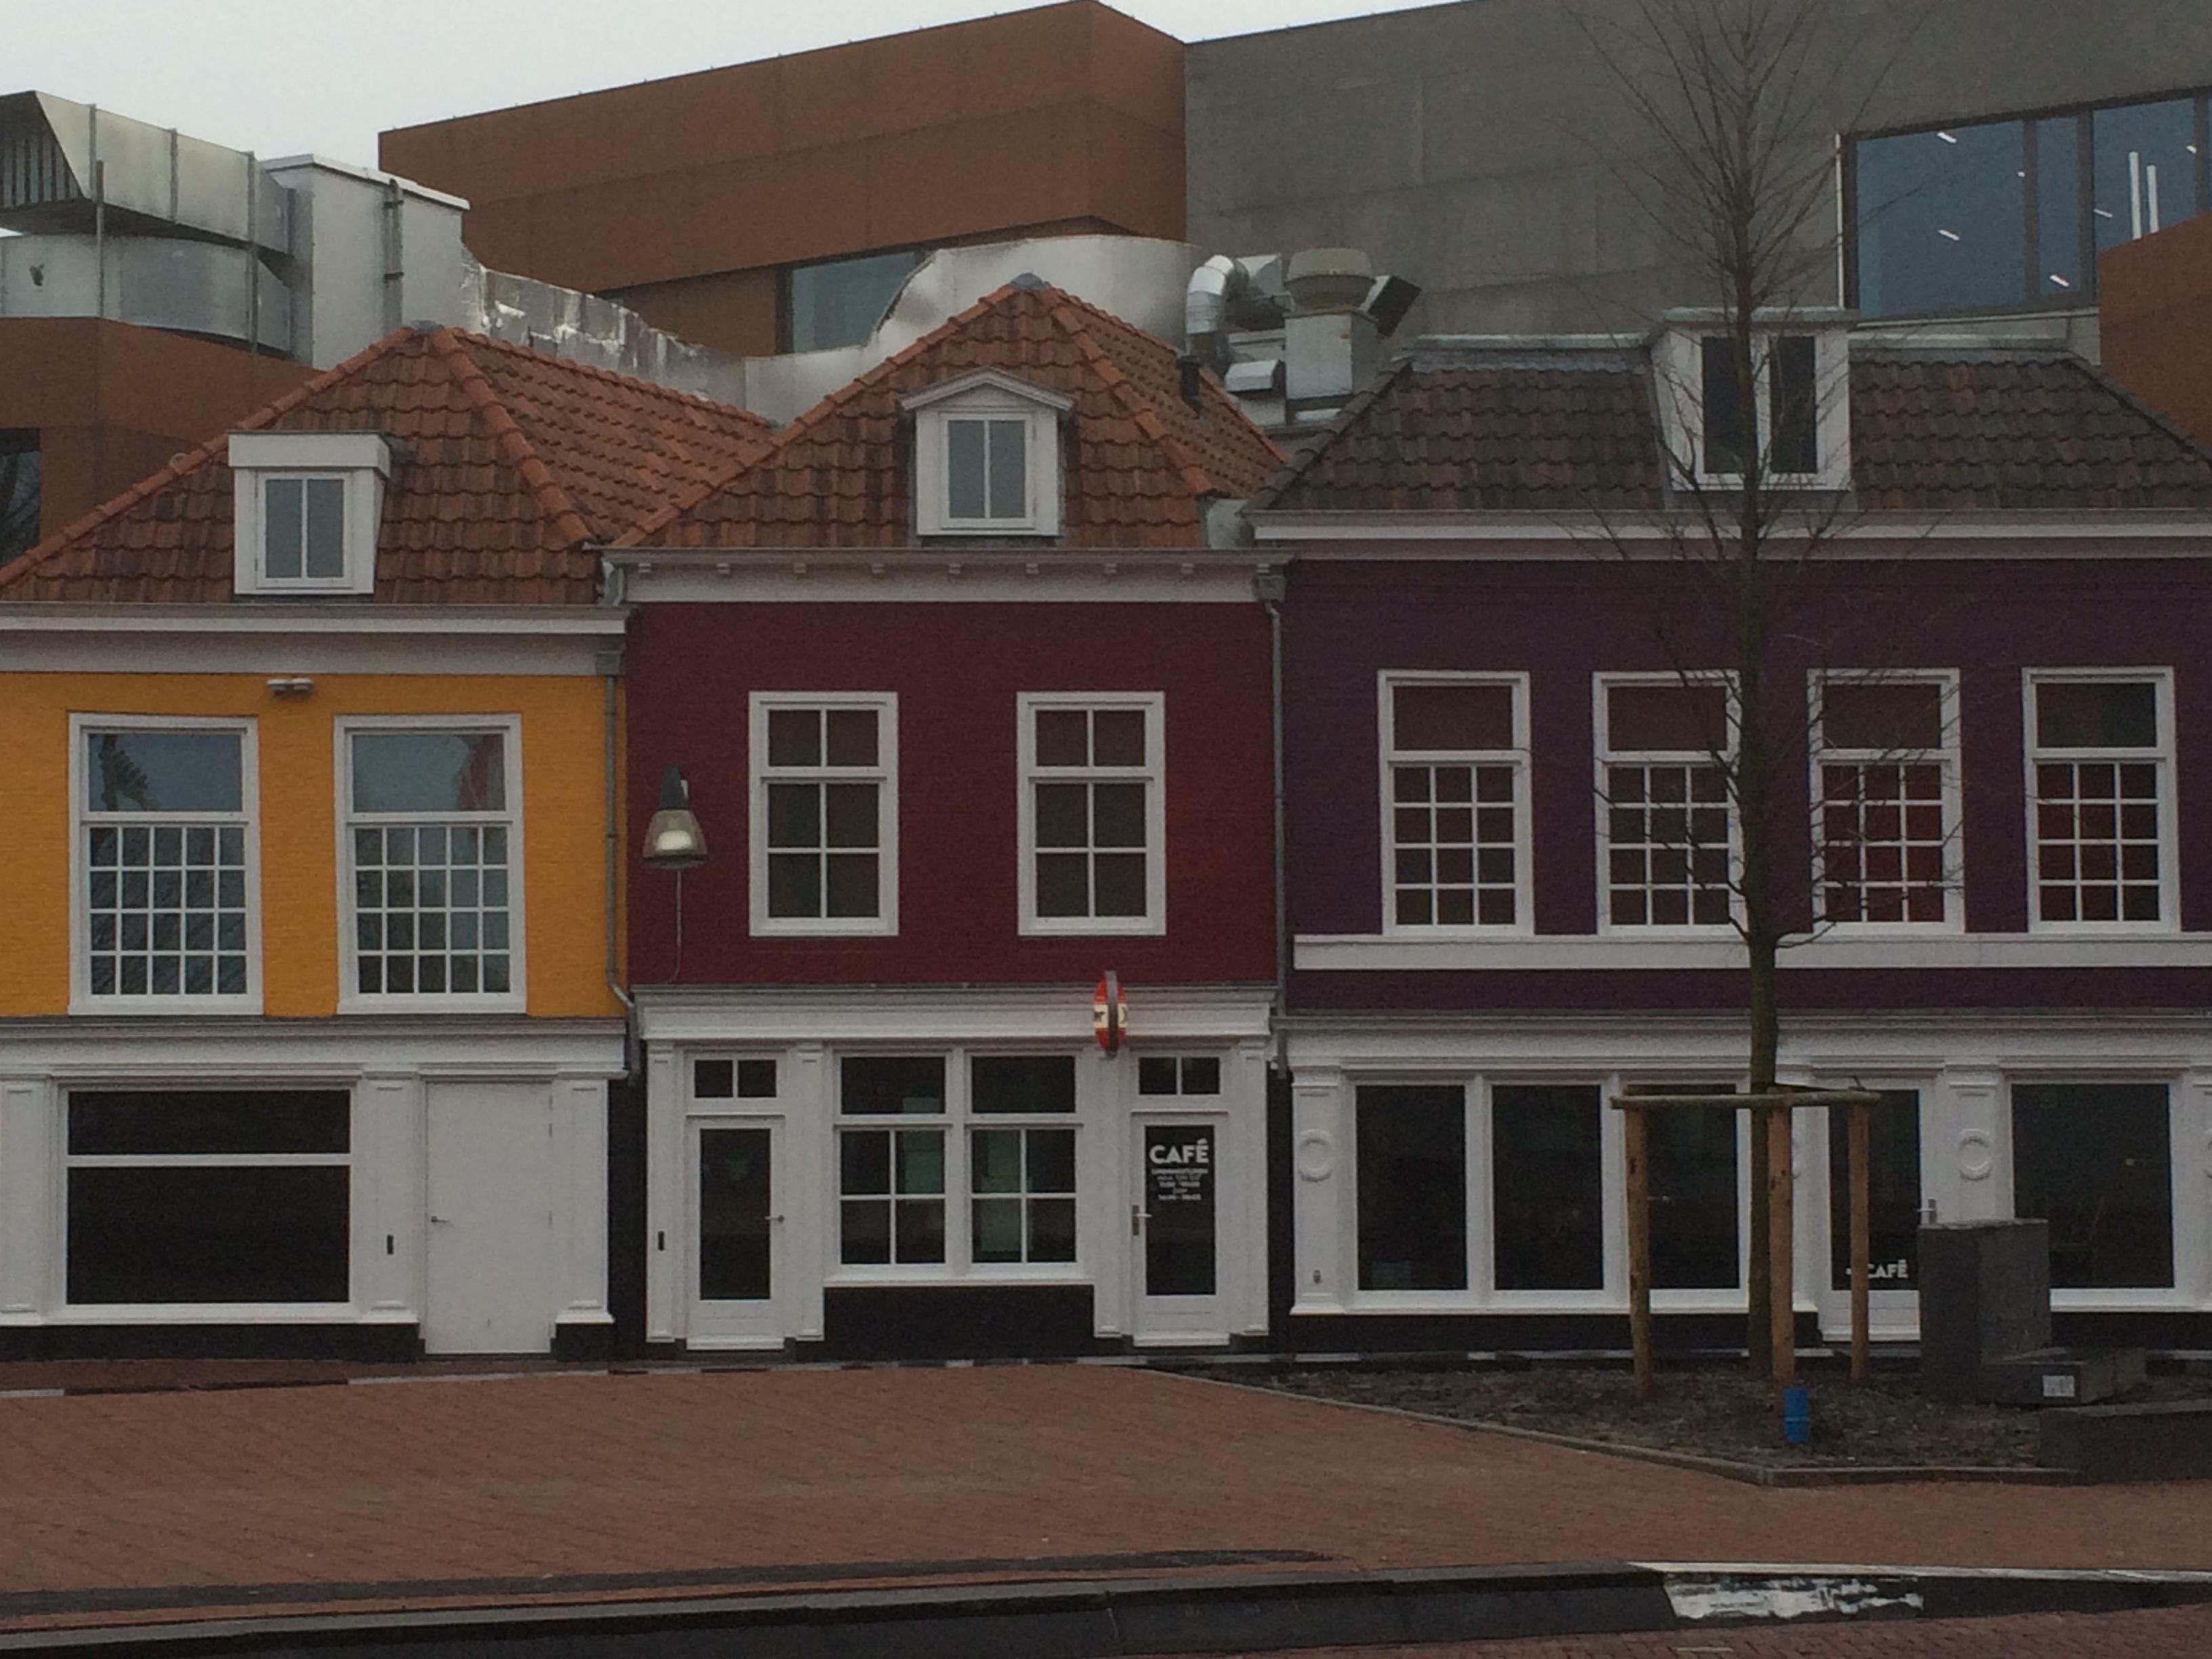 Visiter Leeuwarden: lieux à visiter, hôtels, restaurants, transports, bons plans